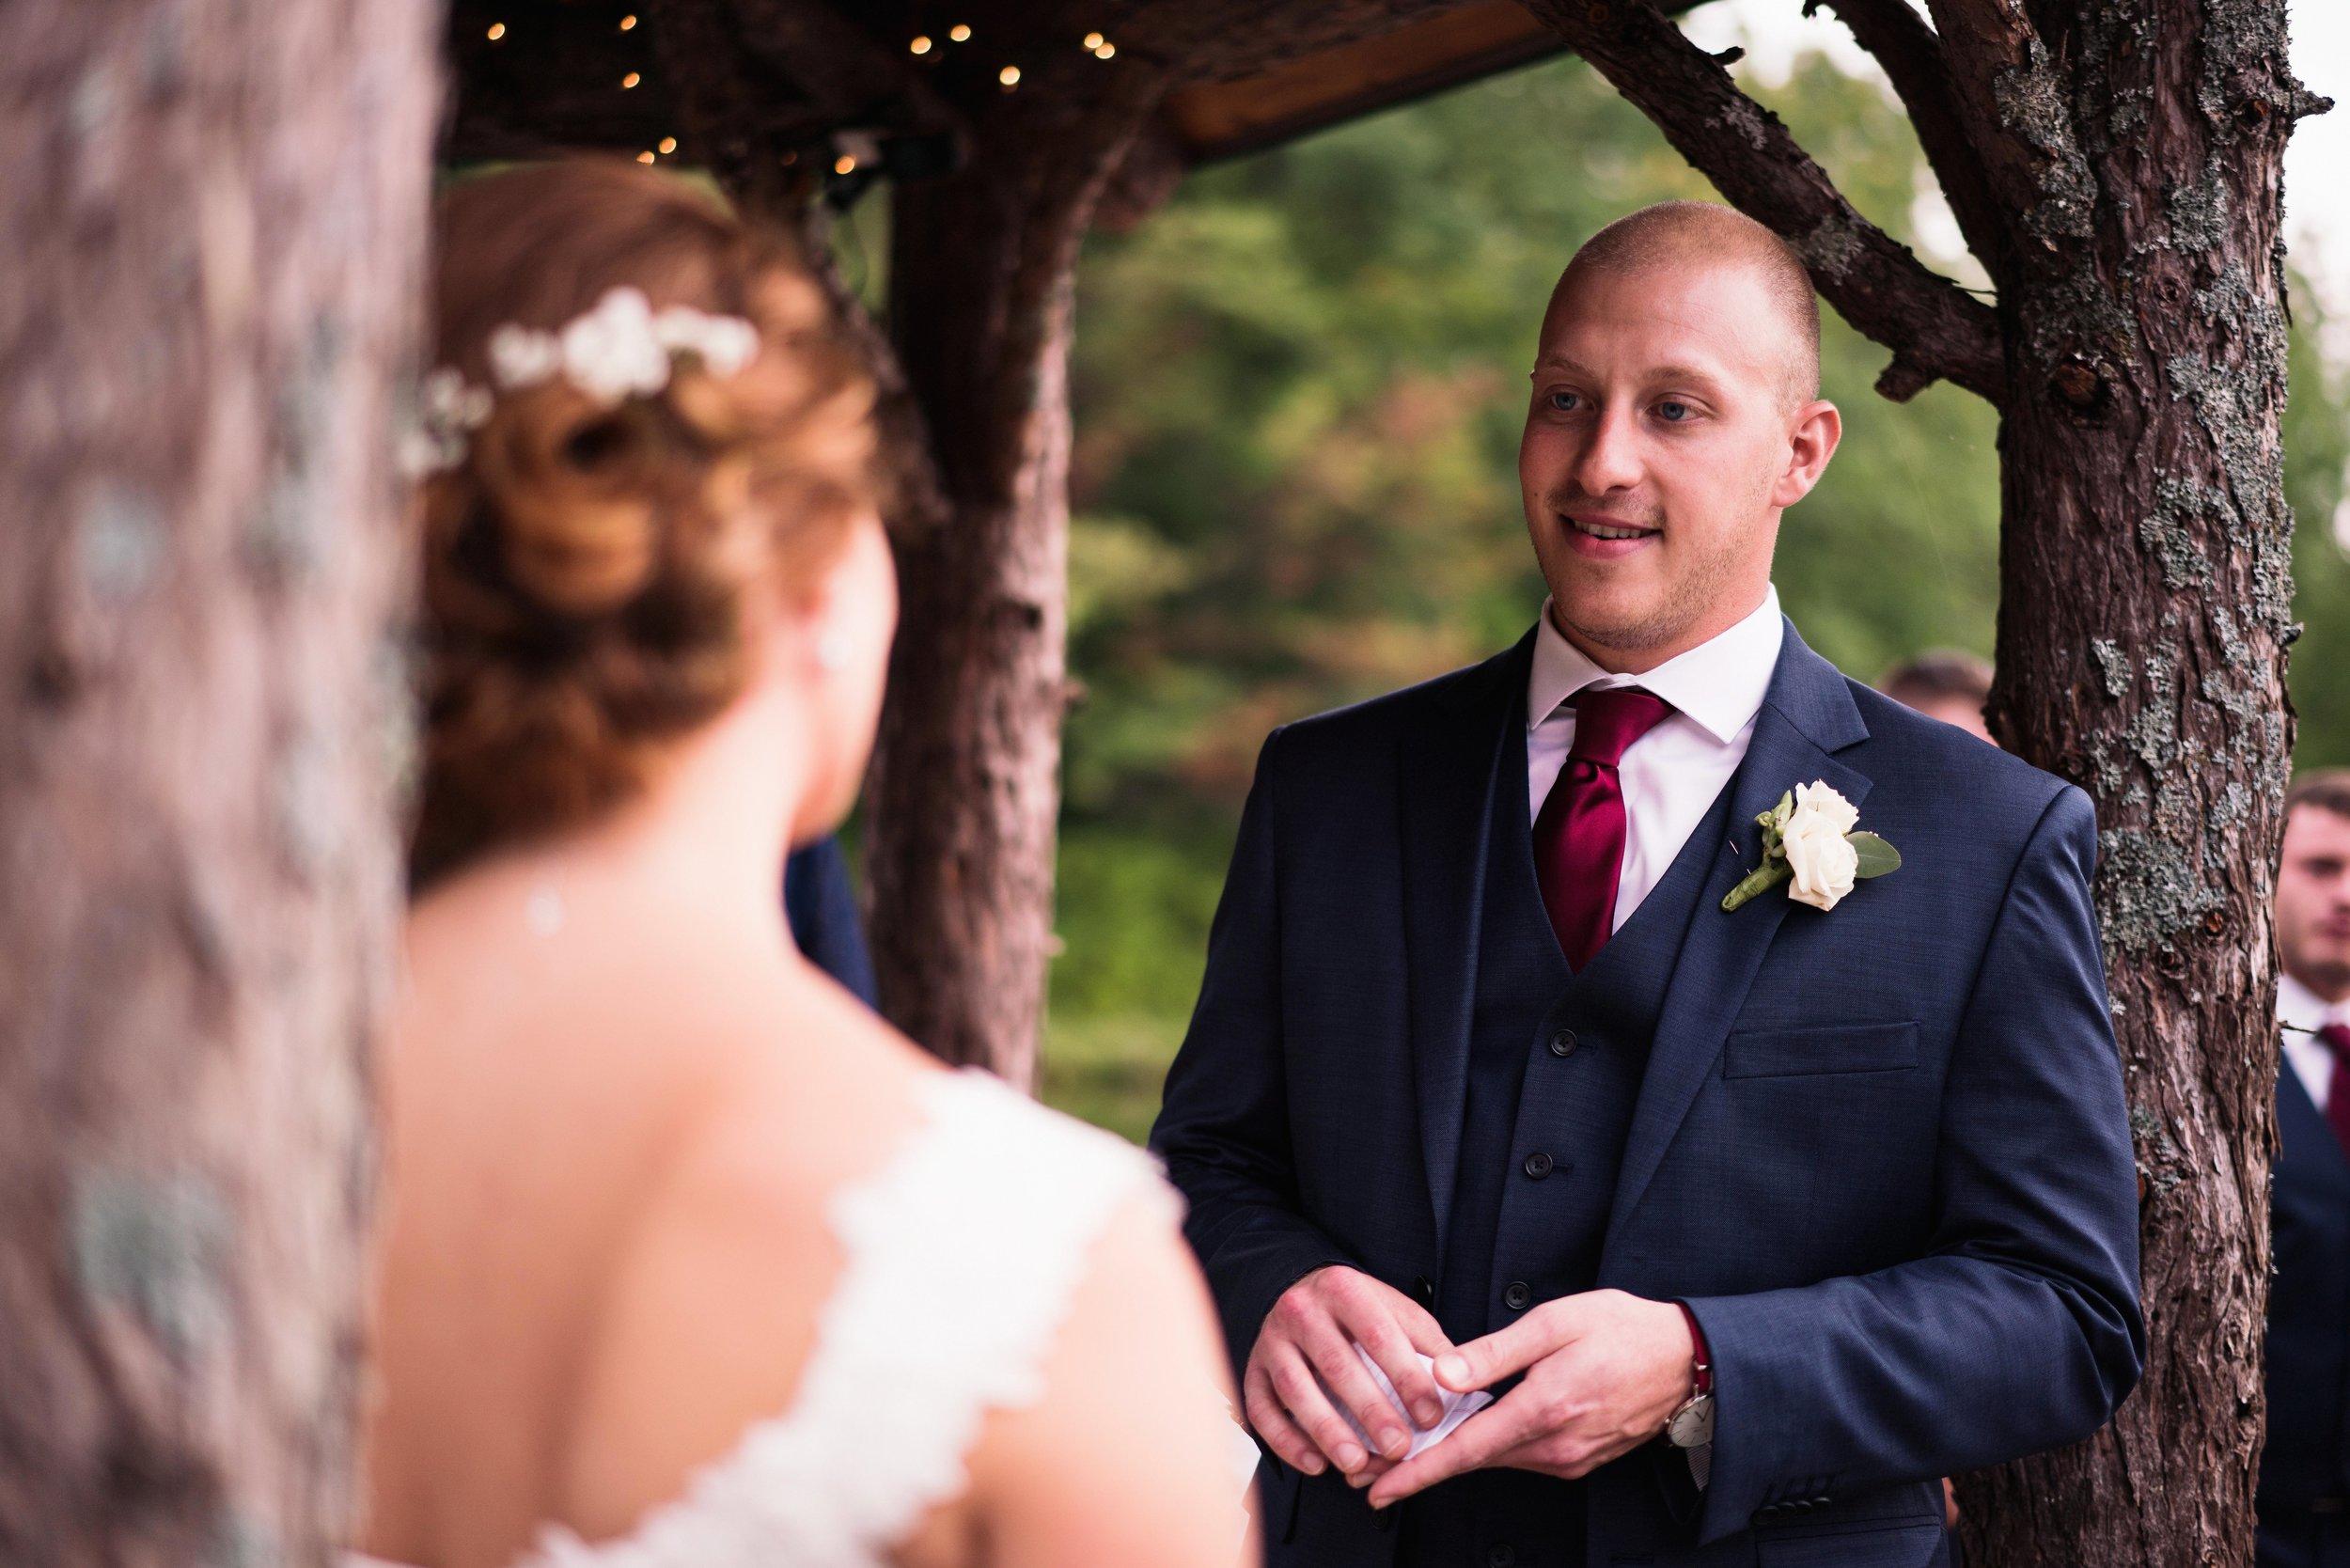 Blog-Lisa-James-Wedding-at Rosebud Estate Weddings in Arcade NY by Stefan-Ludwig-Photography-Buffalo-NY-44-x.jpg